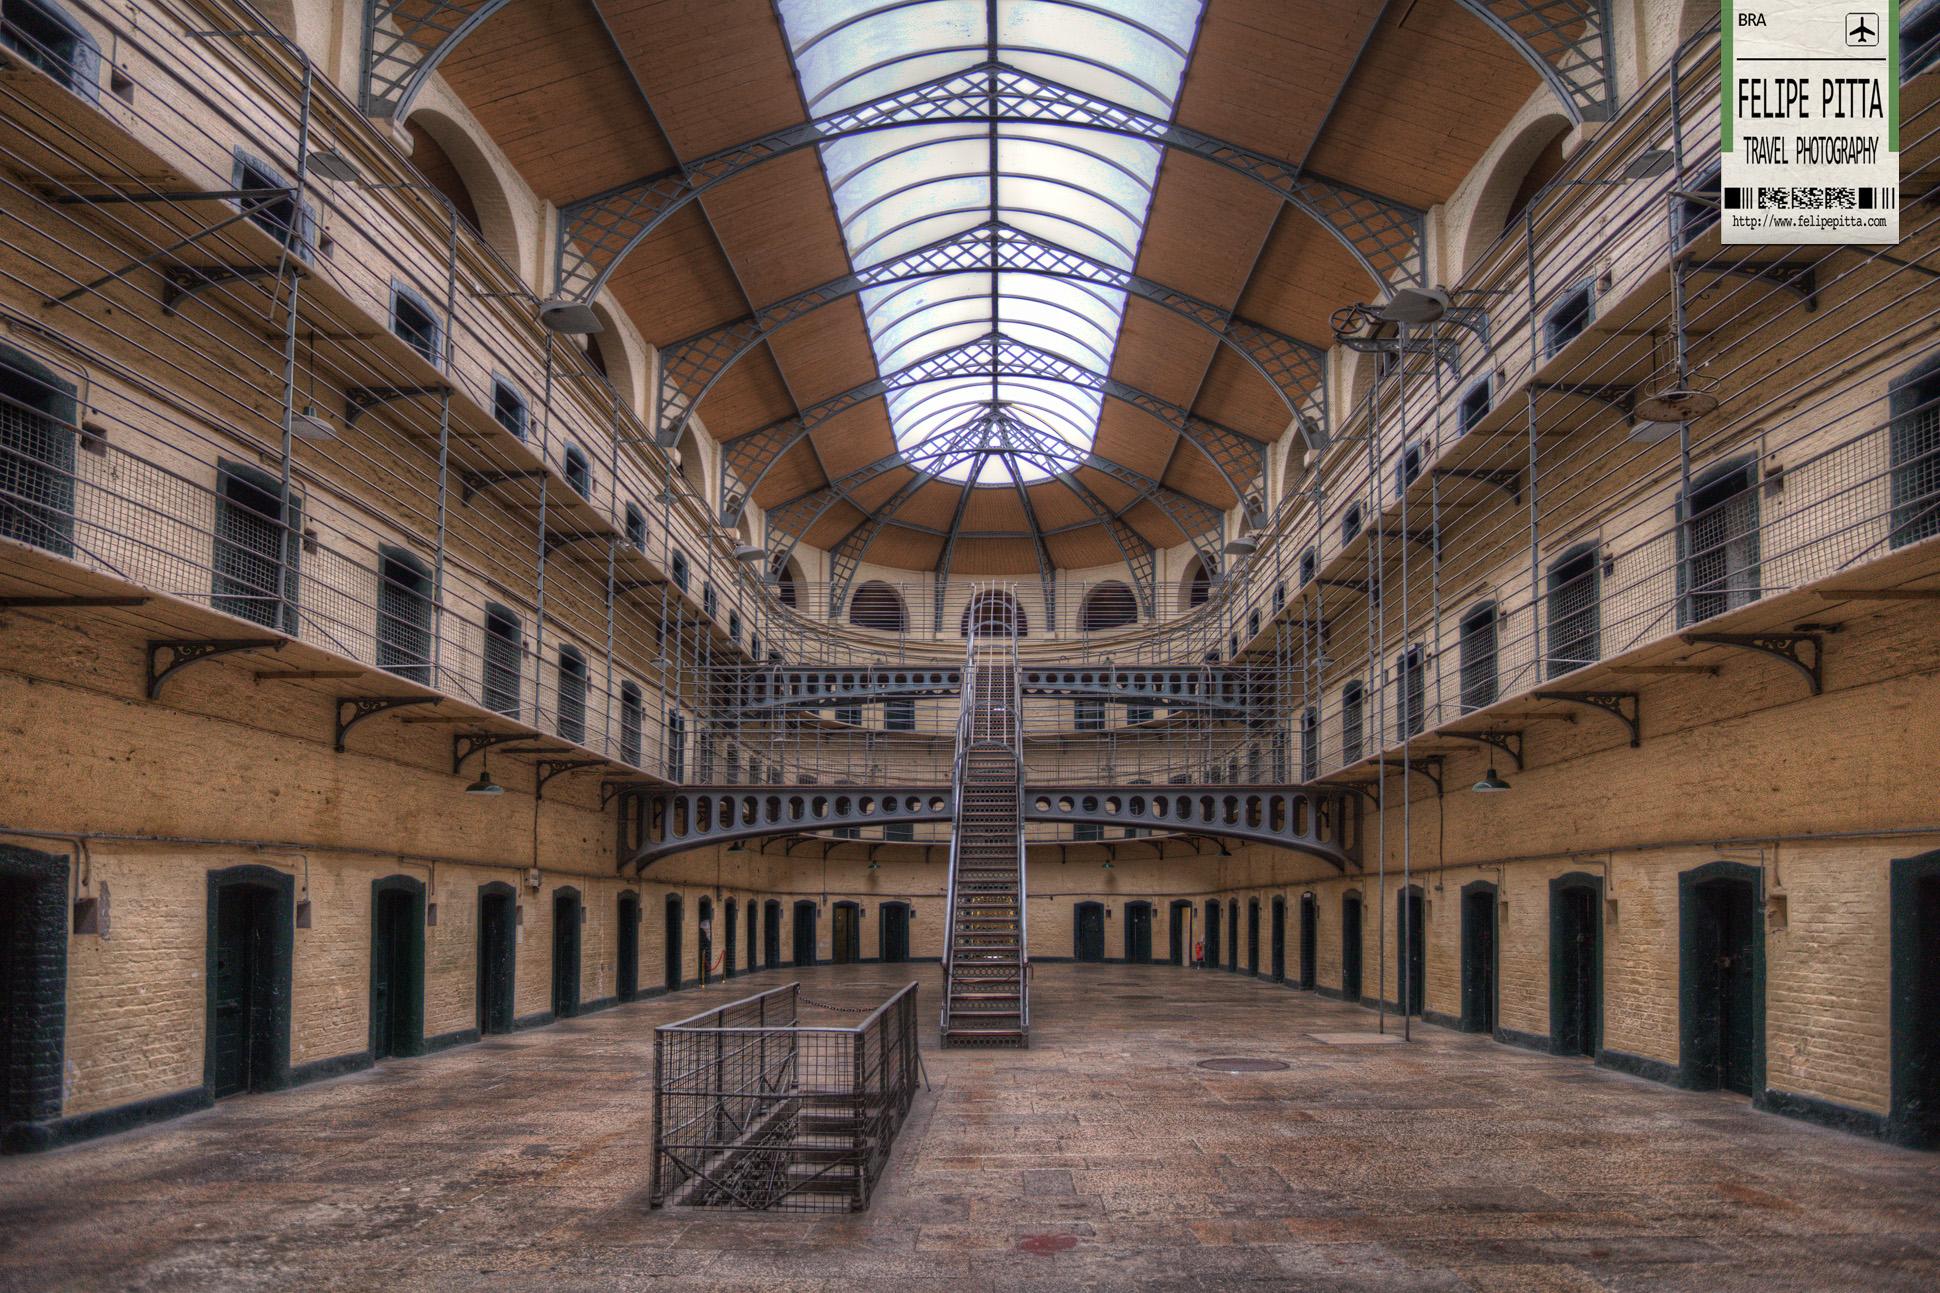 Kilmainham Gaol Old Prison Dublin Ireland